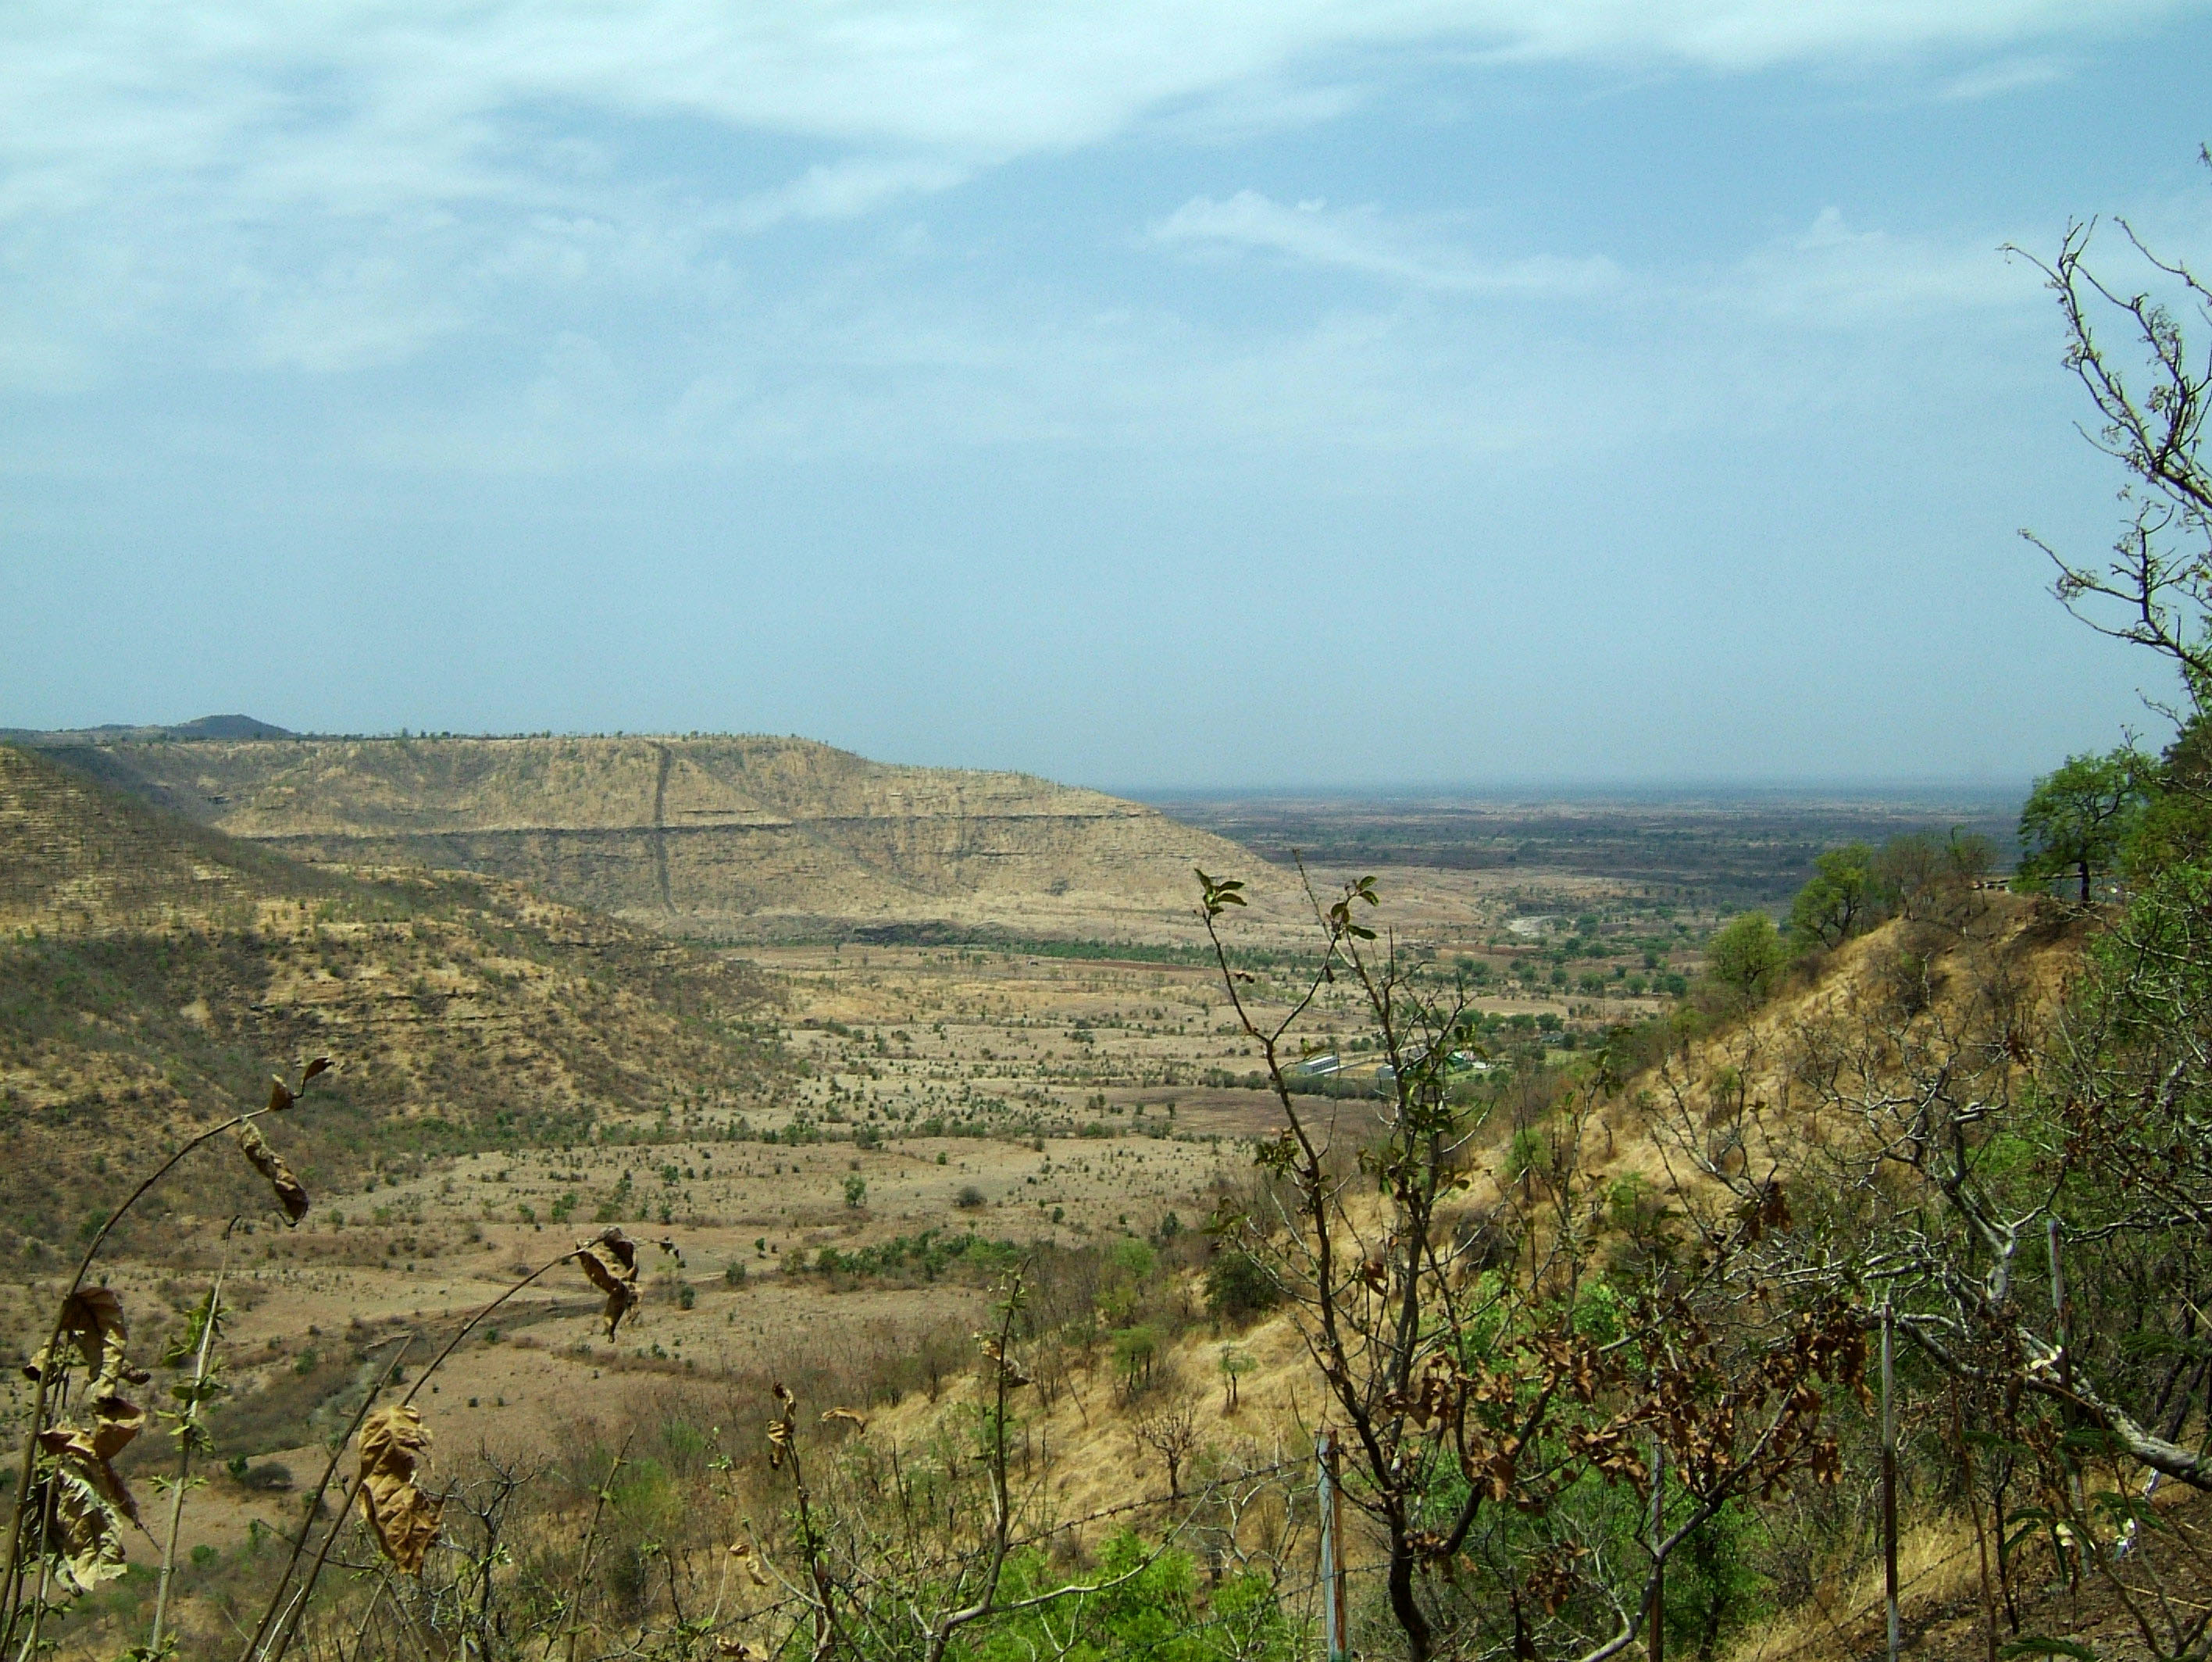 Aurangabad to Ajanta Caves by road India Apr 2004 02